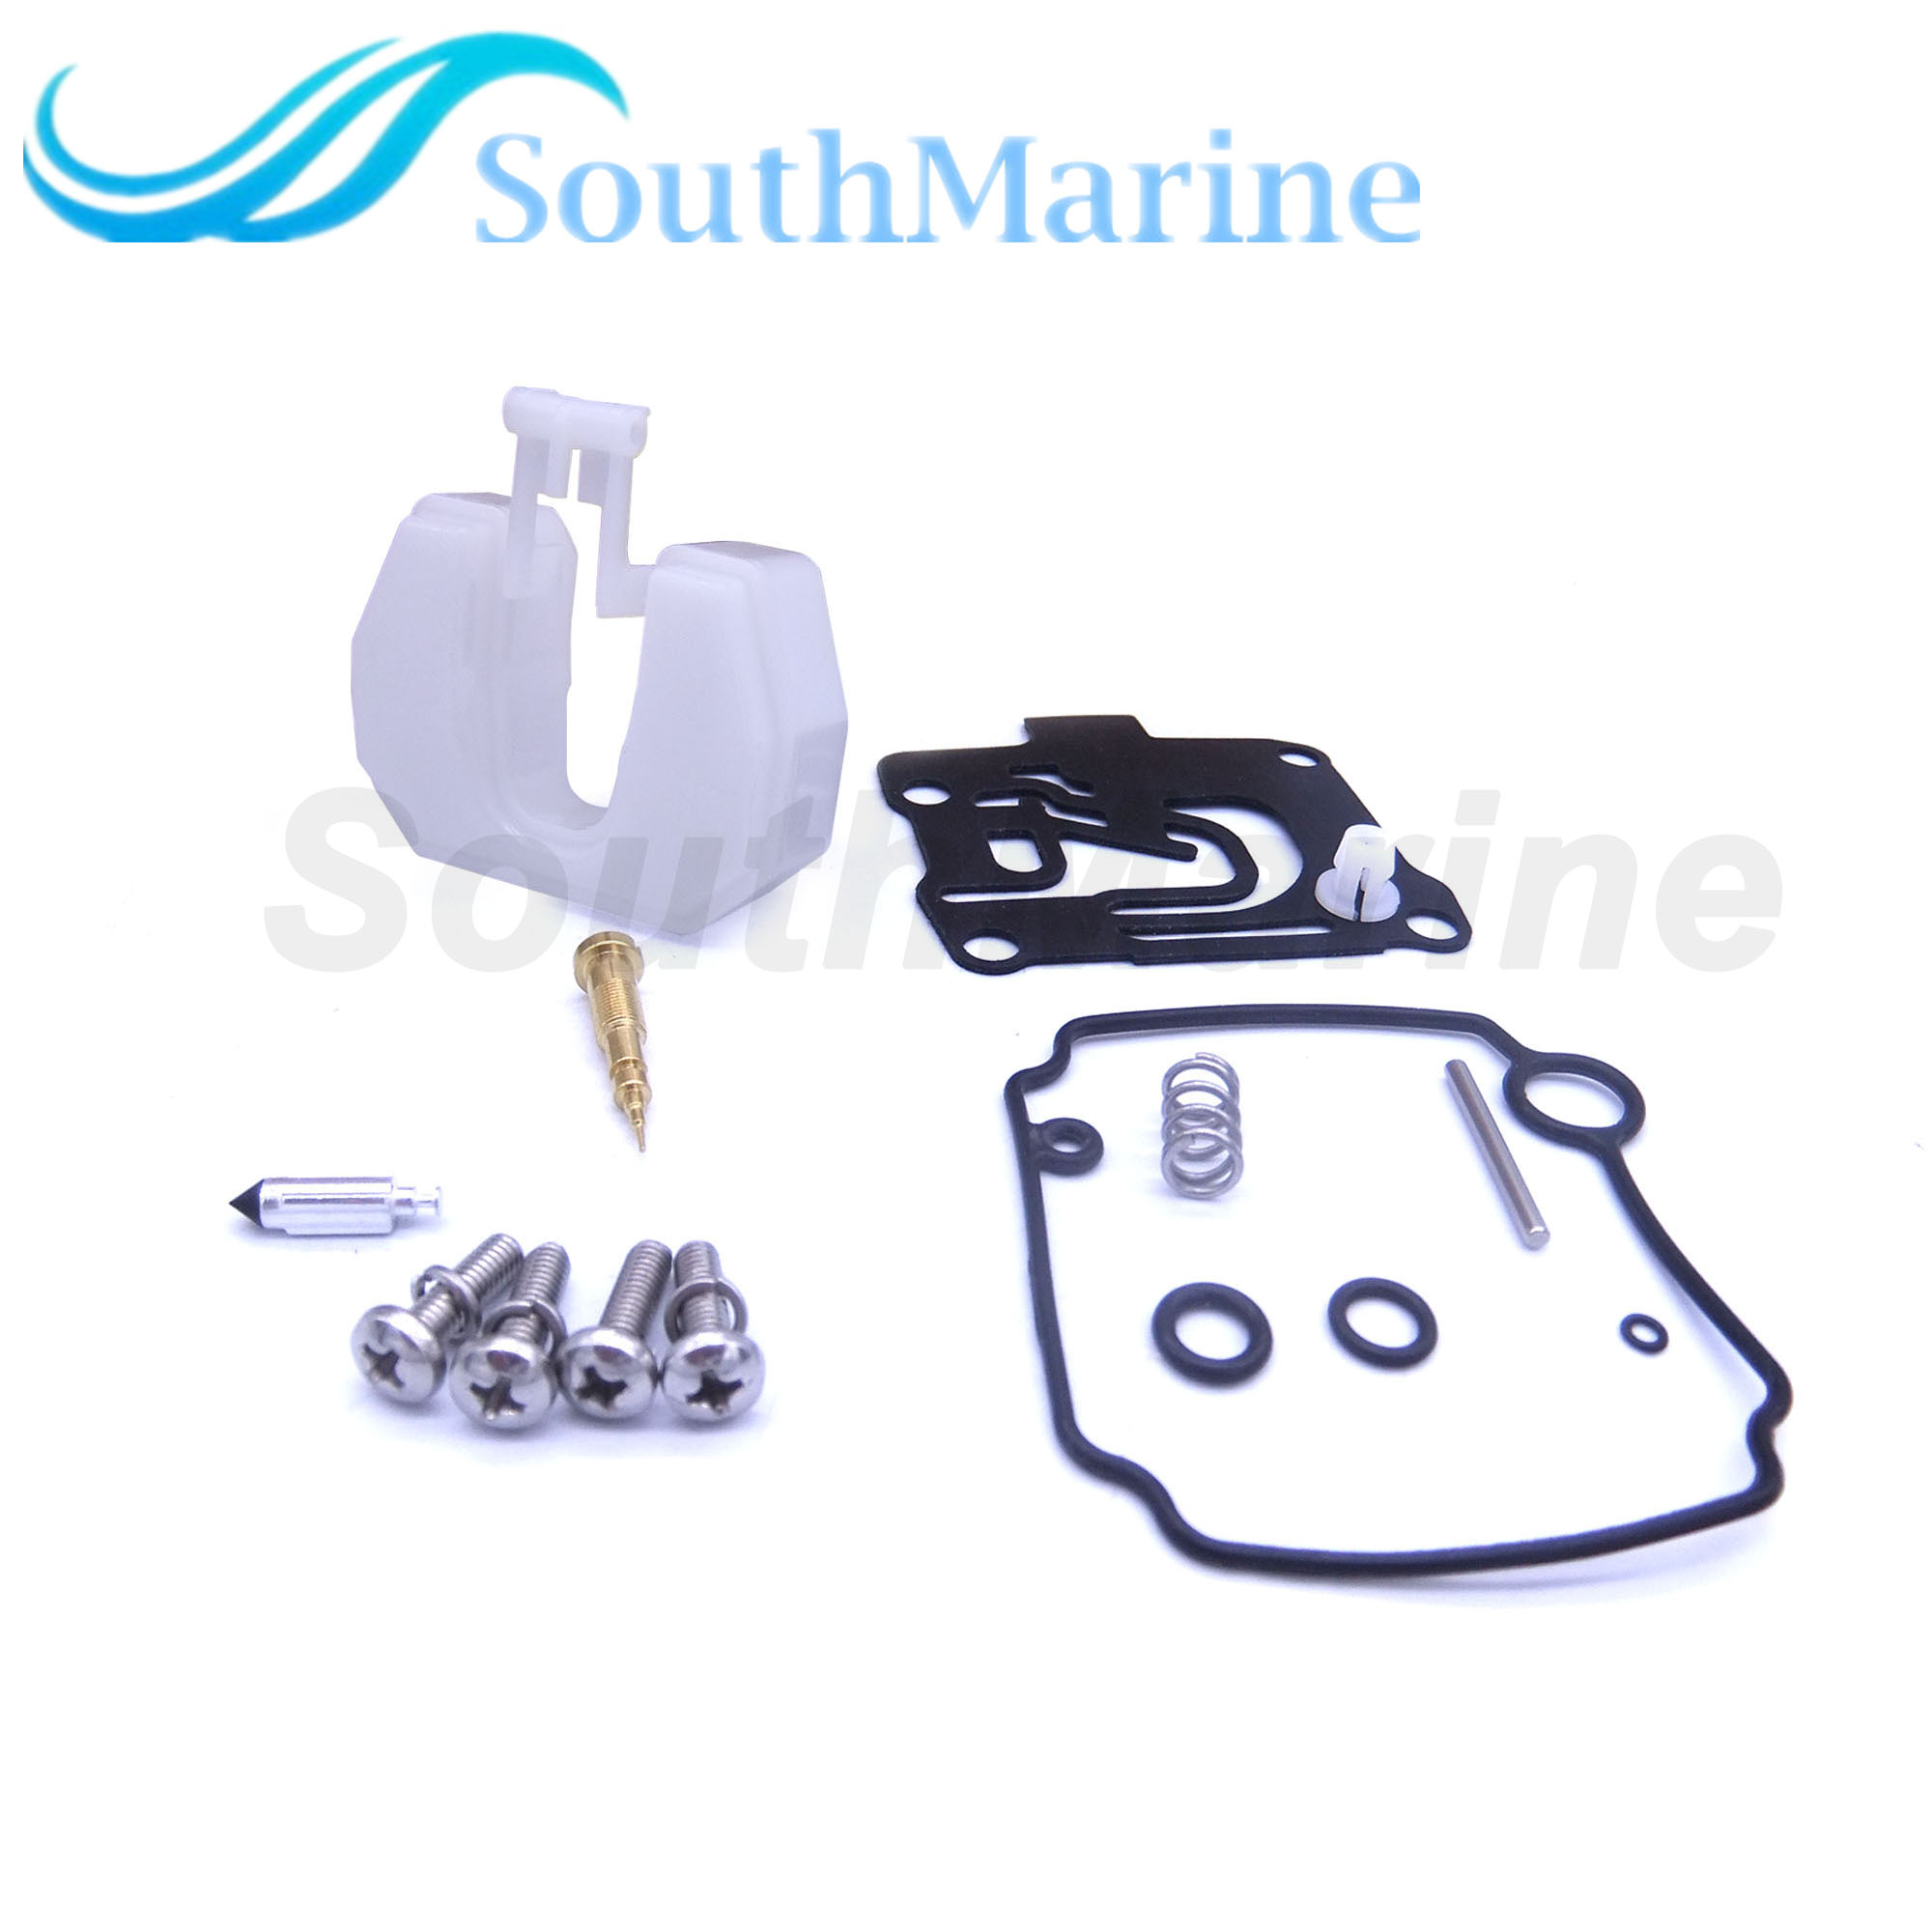 62Y-W0093-10 62Y-W0093-11 Carburetor Repair Kit For Yamaha Outboard Engine 50HP T50 F50